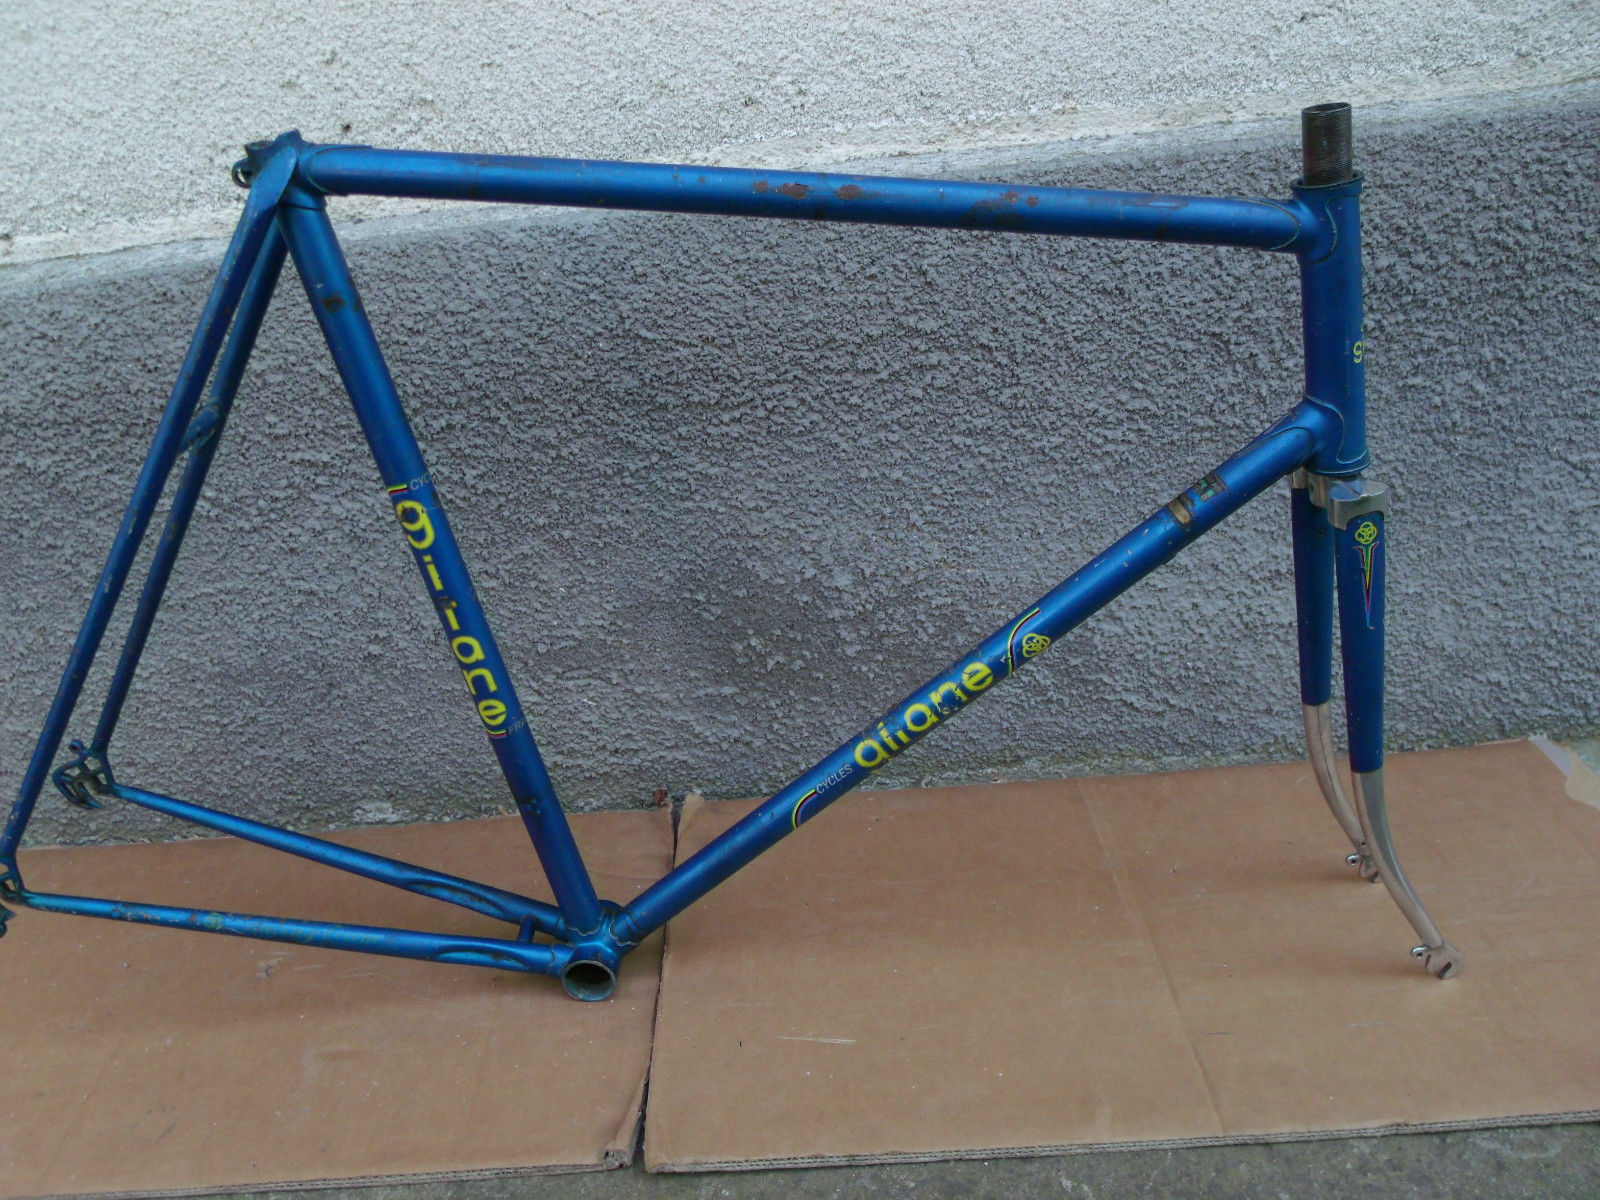 Vintage Gitane Tour de France RahSie Reynolds 531 Rennrad RahSie